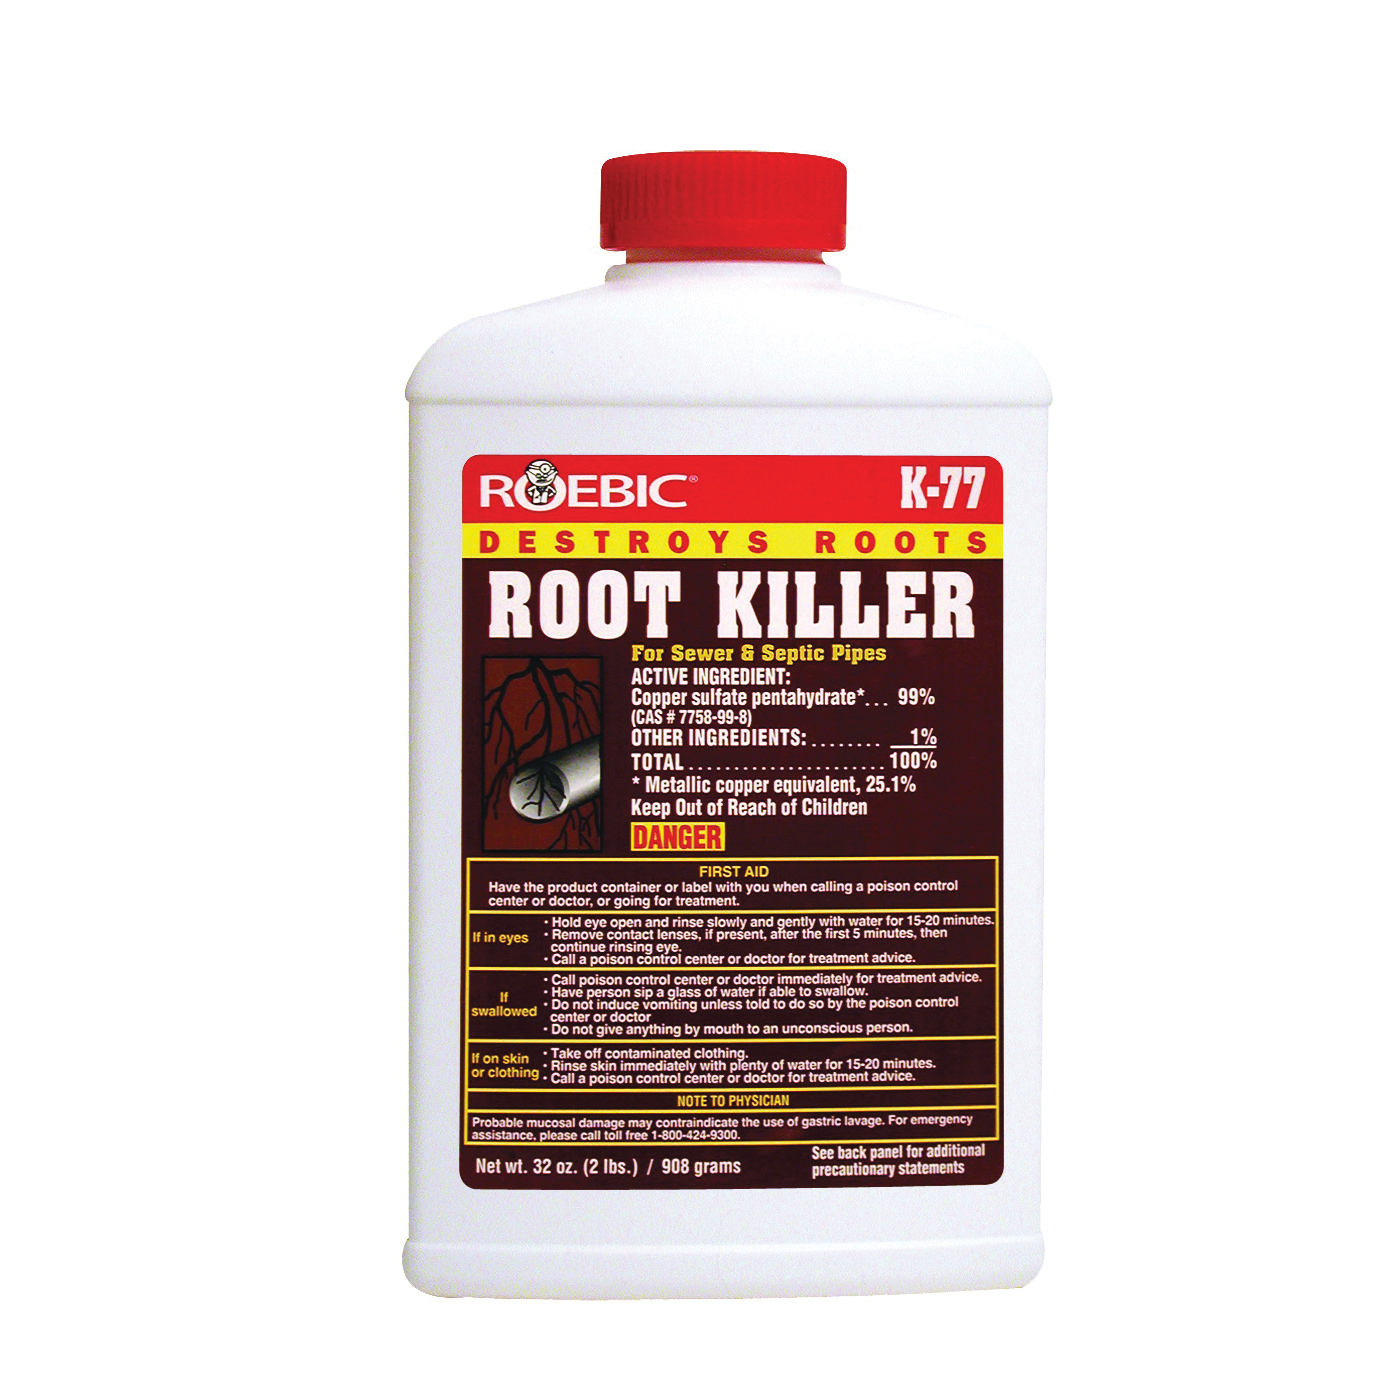 Picture of ROEBIC K-77 Root Killer, Crystal, Powder, 2 lb, Bottle